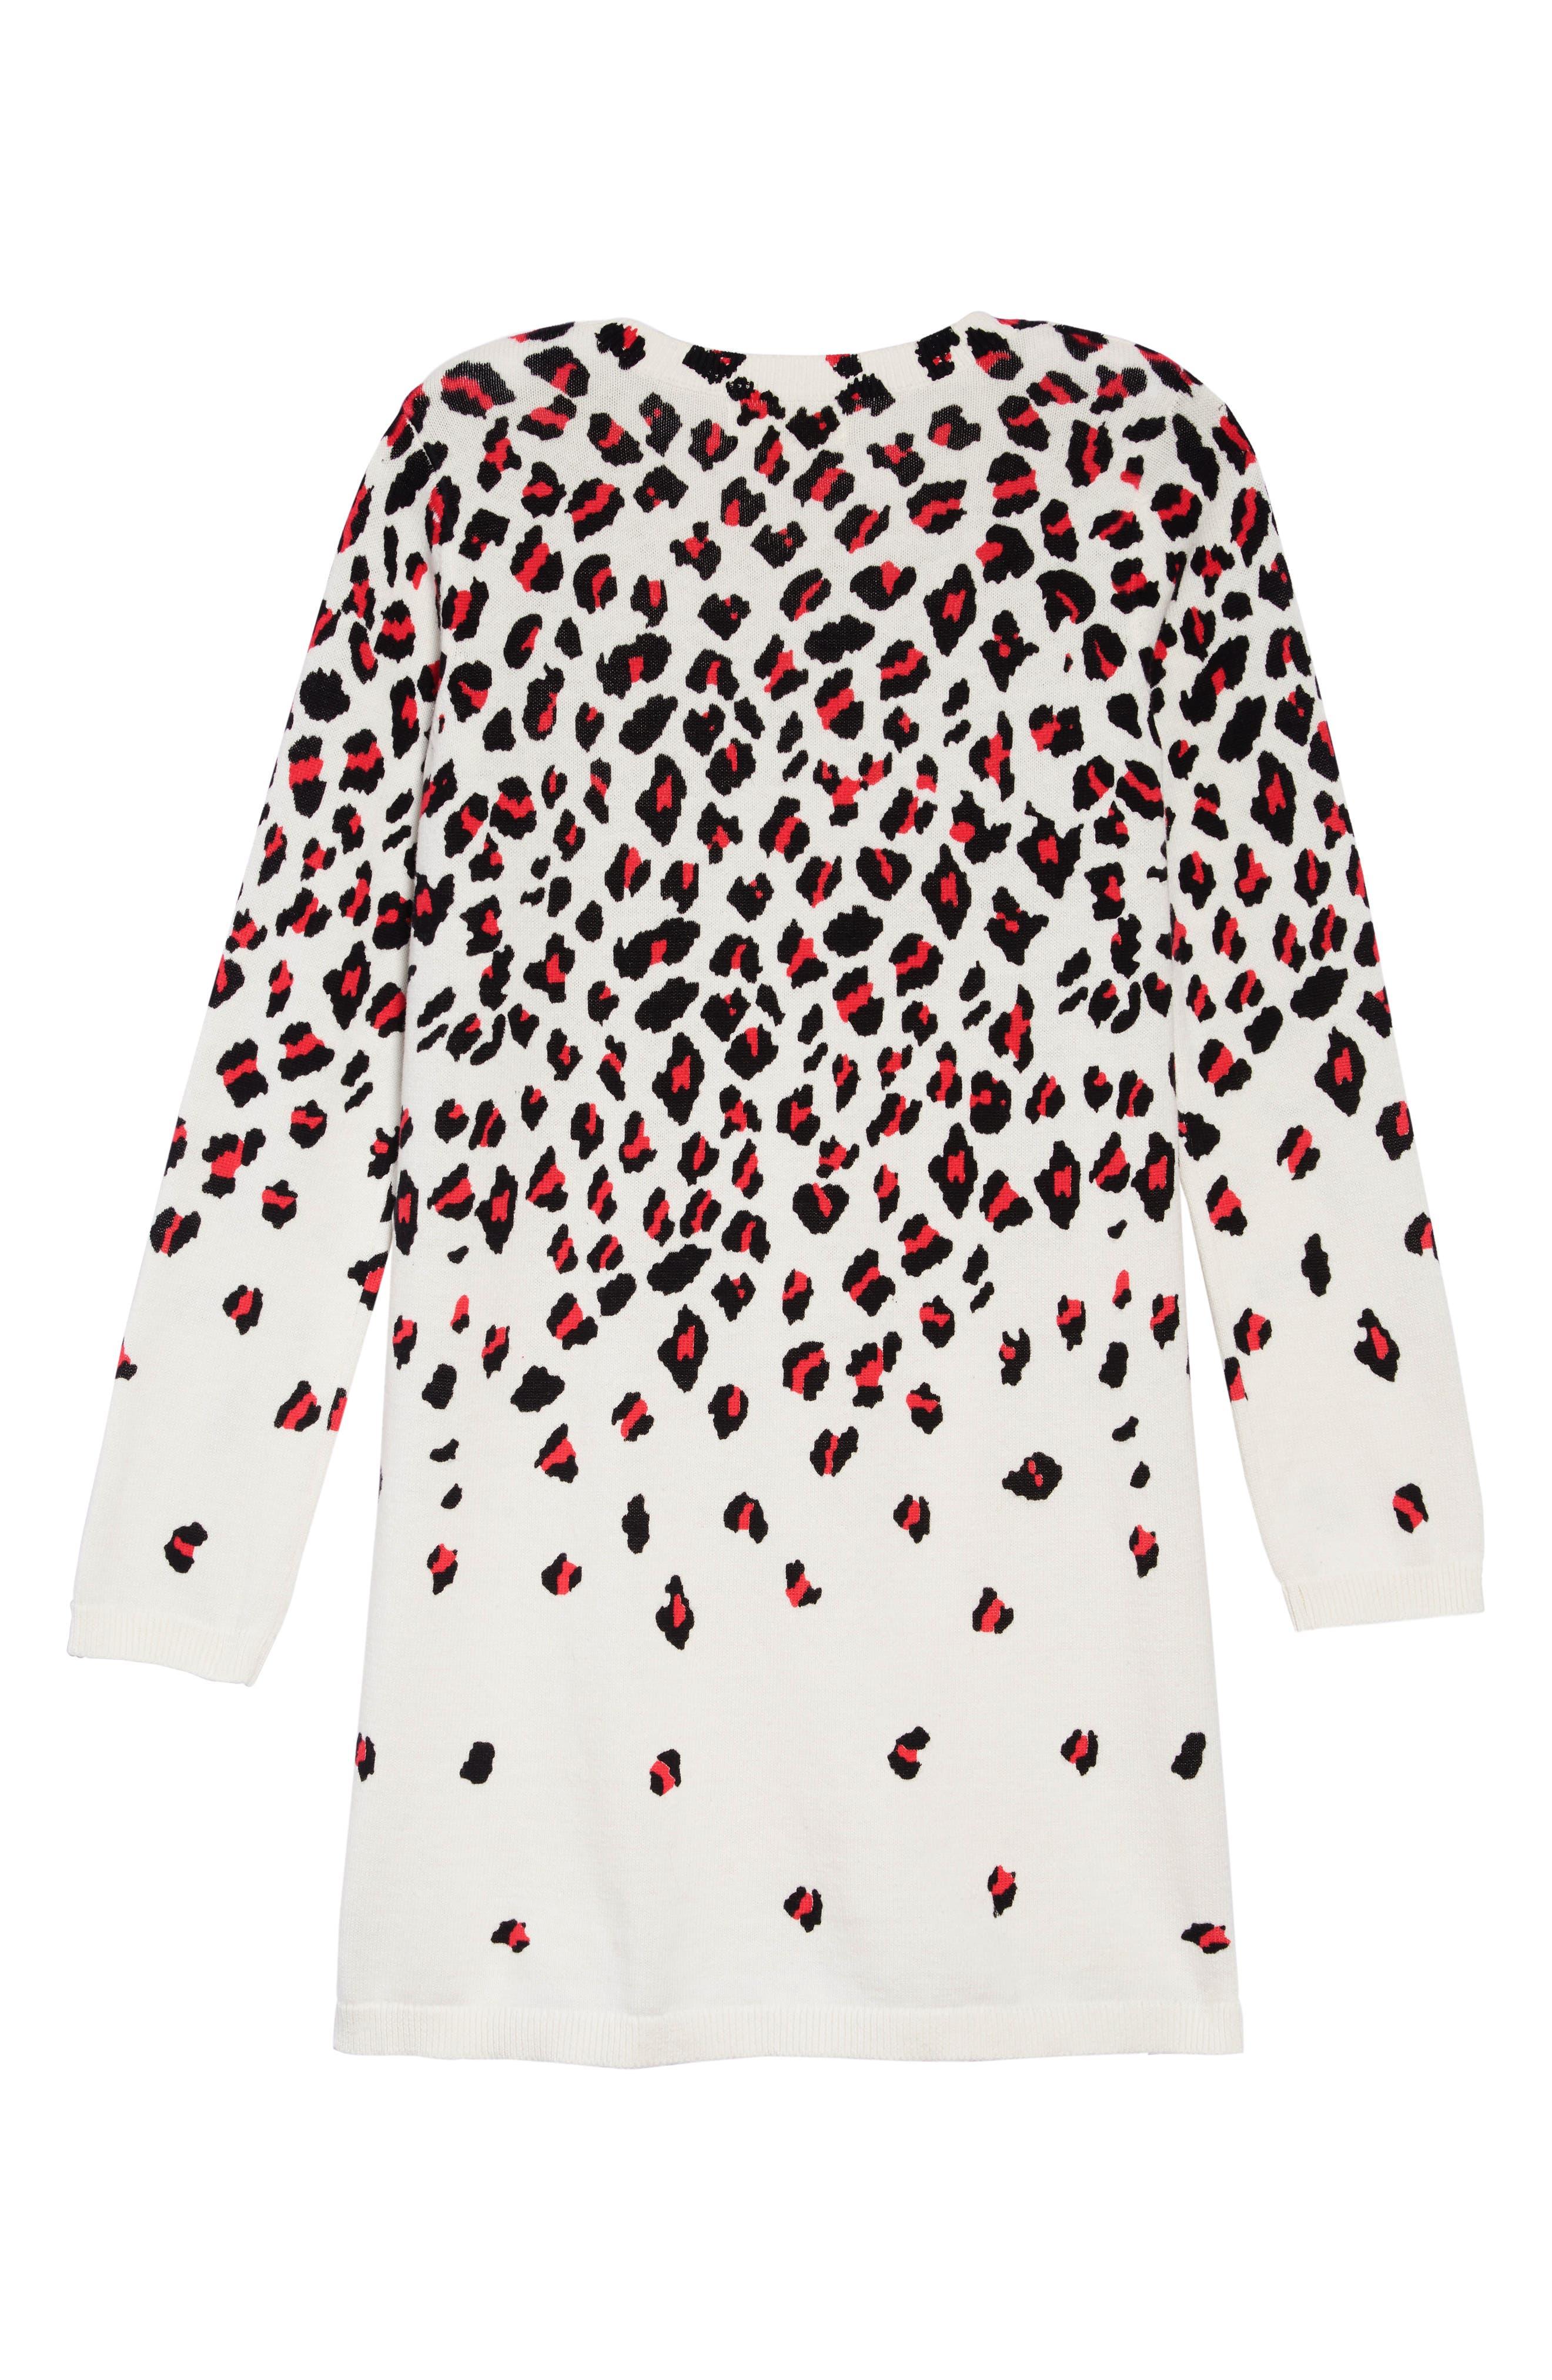 Sweater Dress,                             Alternate thumbnail 2, color,                             IVORY EGRET CHEETAH